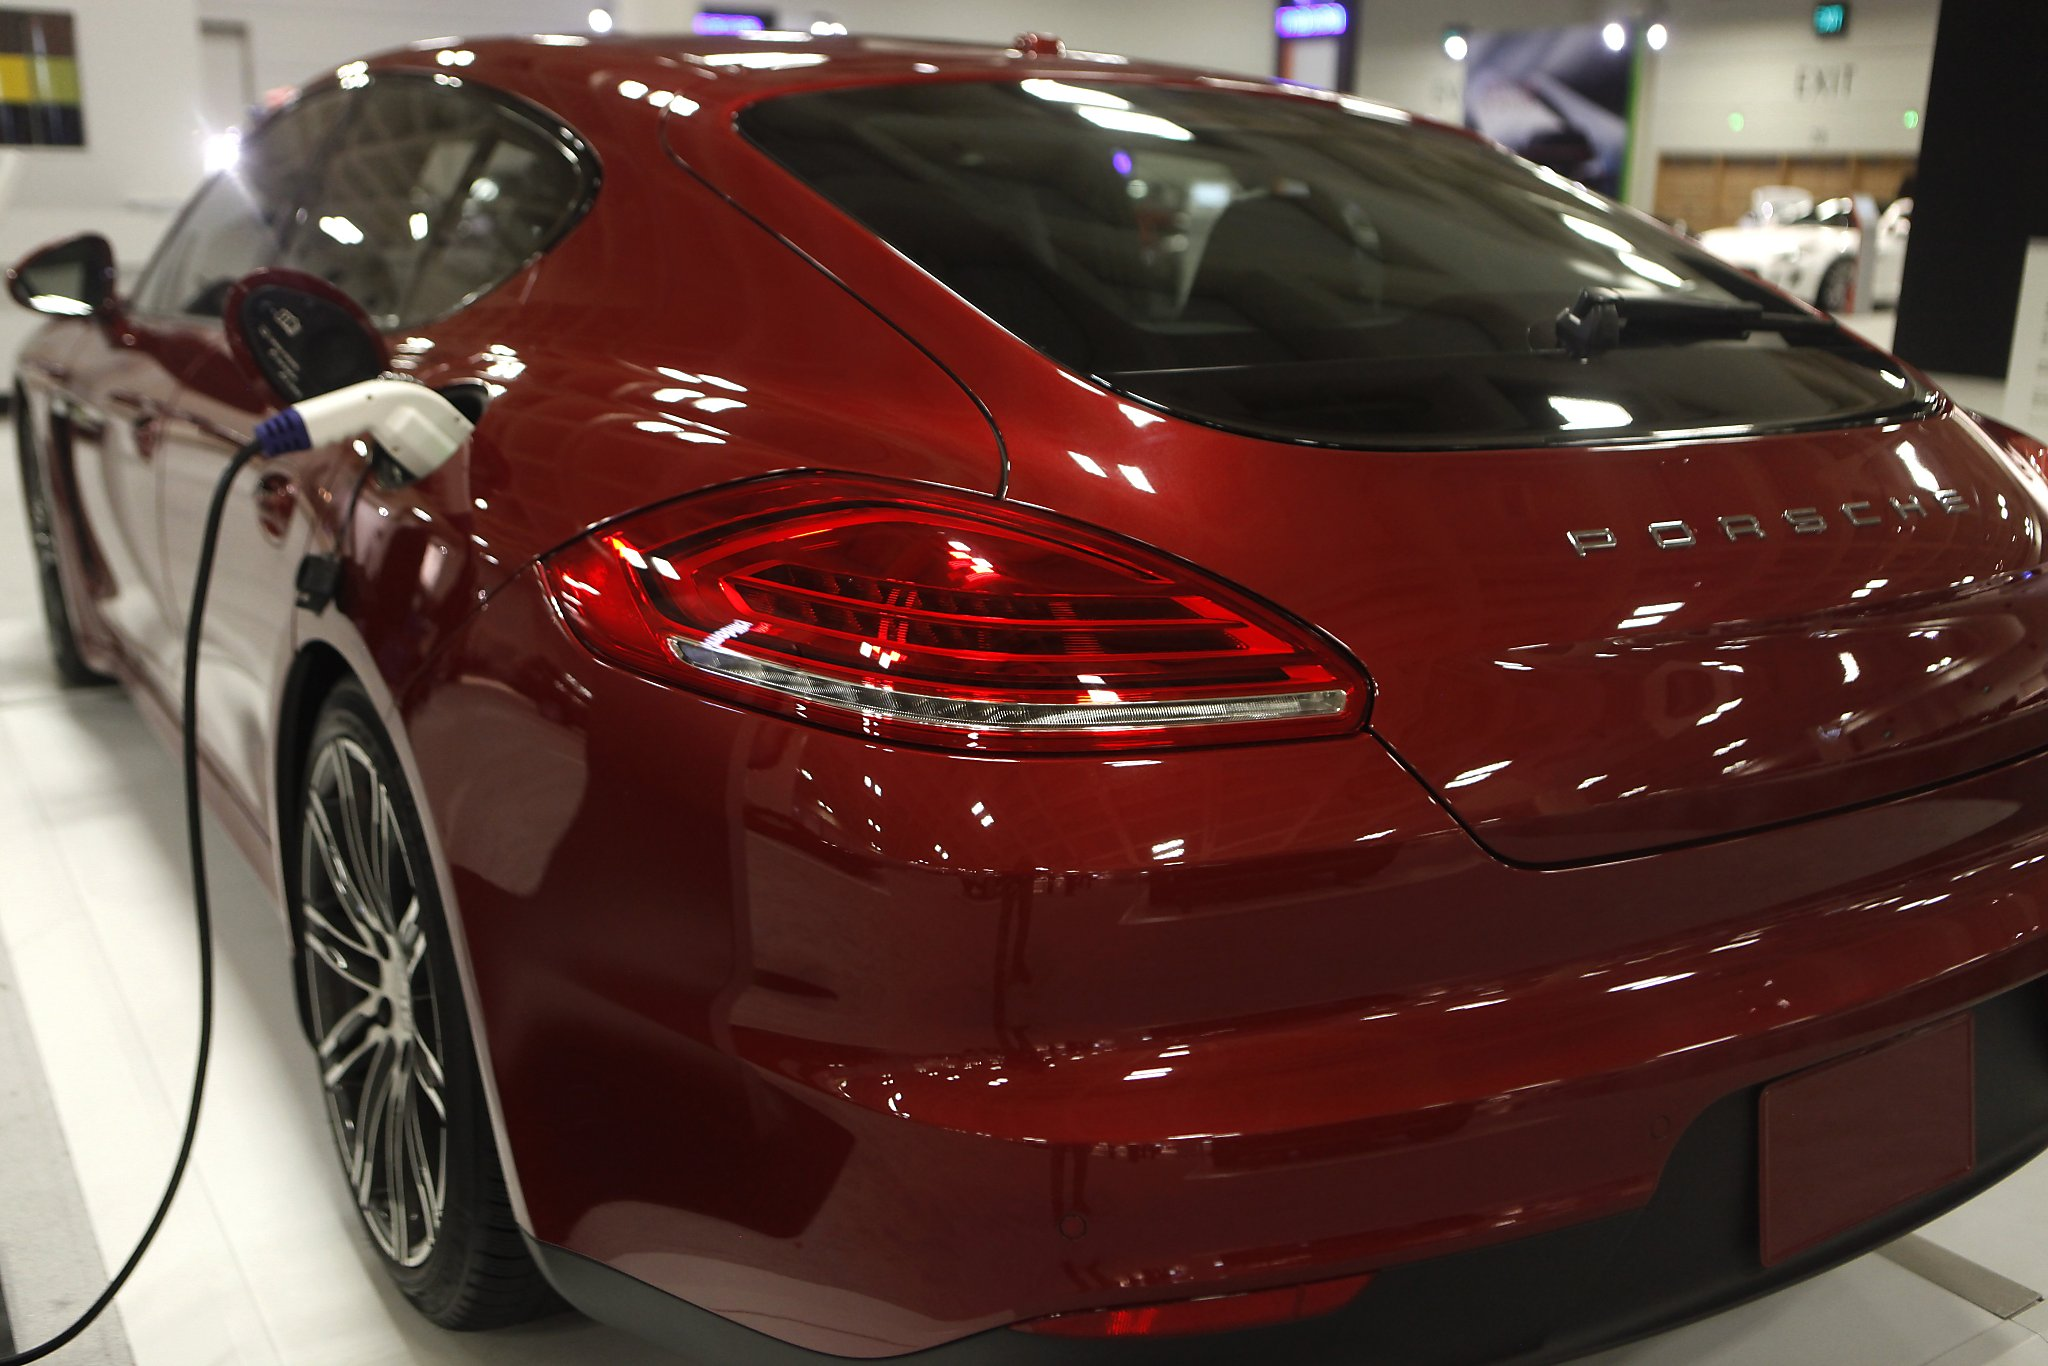 San Francisco International Auto Show 2014 - SFGate